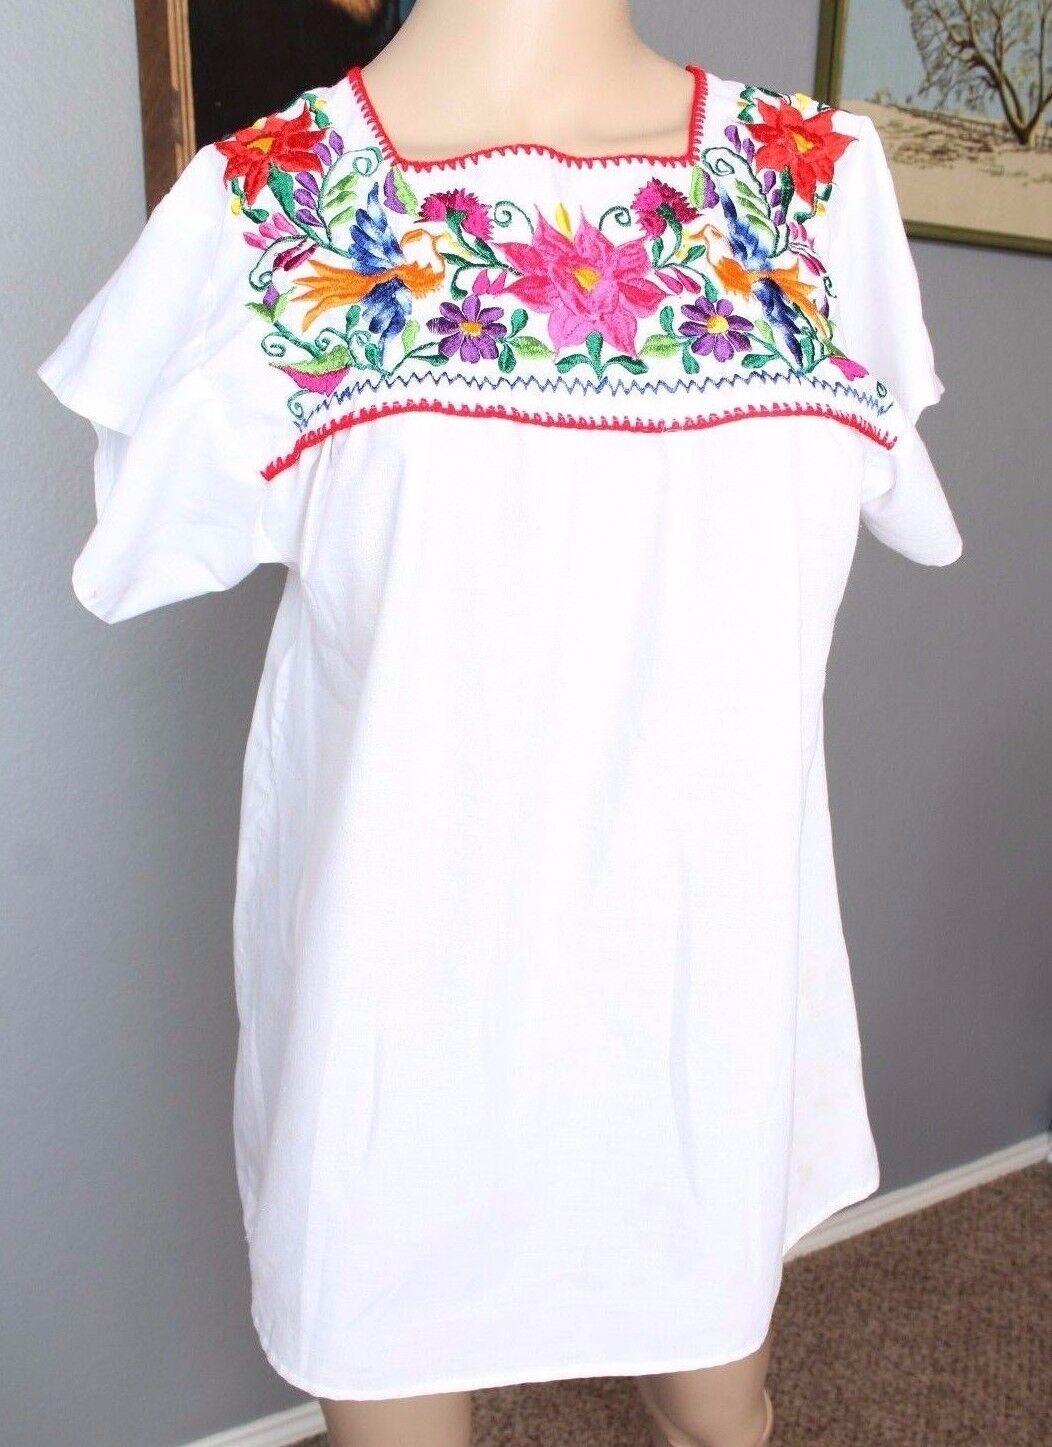 VTG Mexican Oaxacan Embroiderot Floral Bird Rainbow Boho Festival Blouse S M